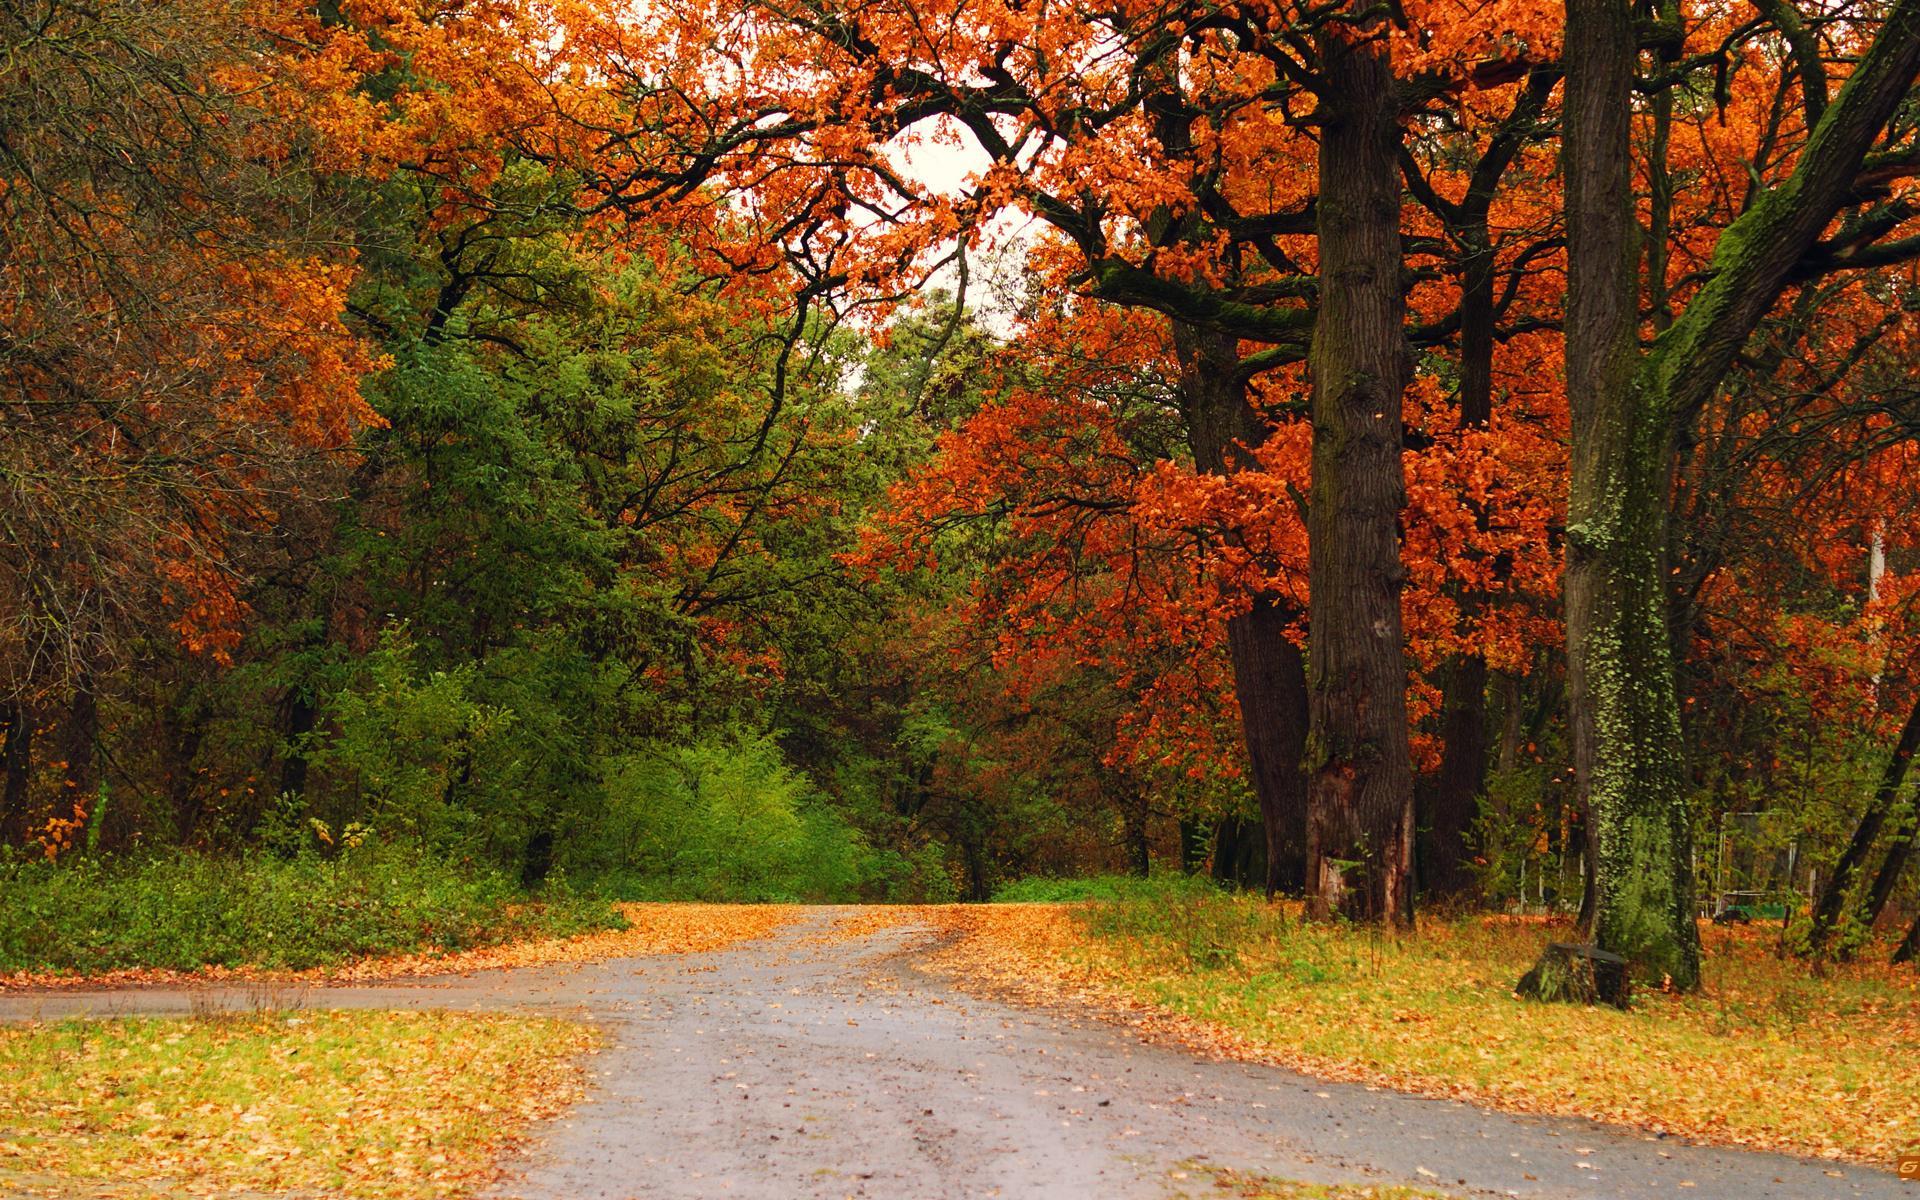 Fall Woodsy Pc Wallpaper Fondos Oto 241 O Wallpapers Autumn Fondos De Pantalla De Oto 241 O